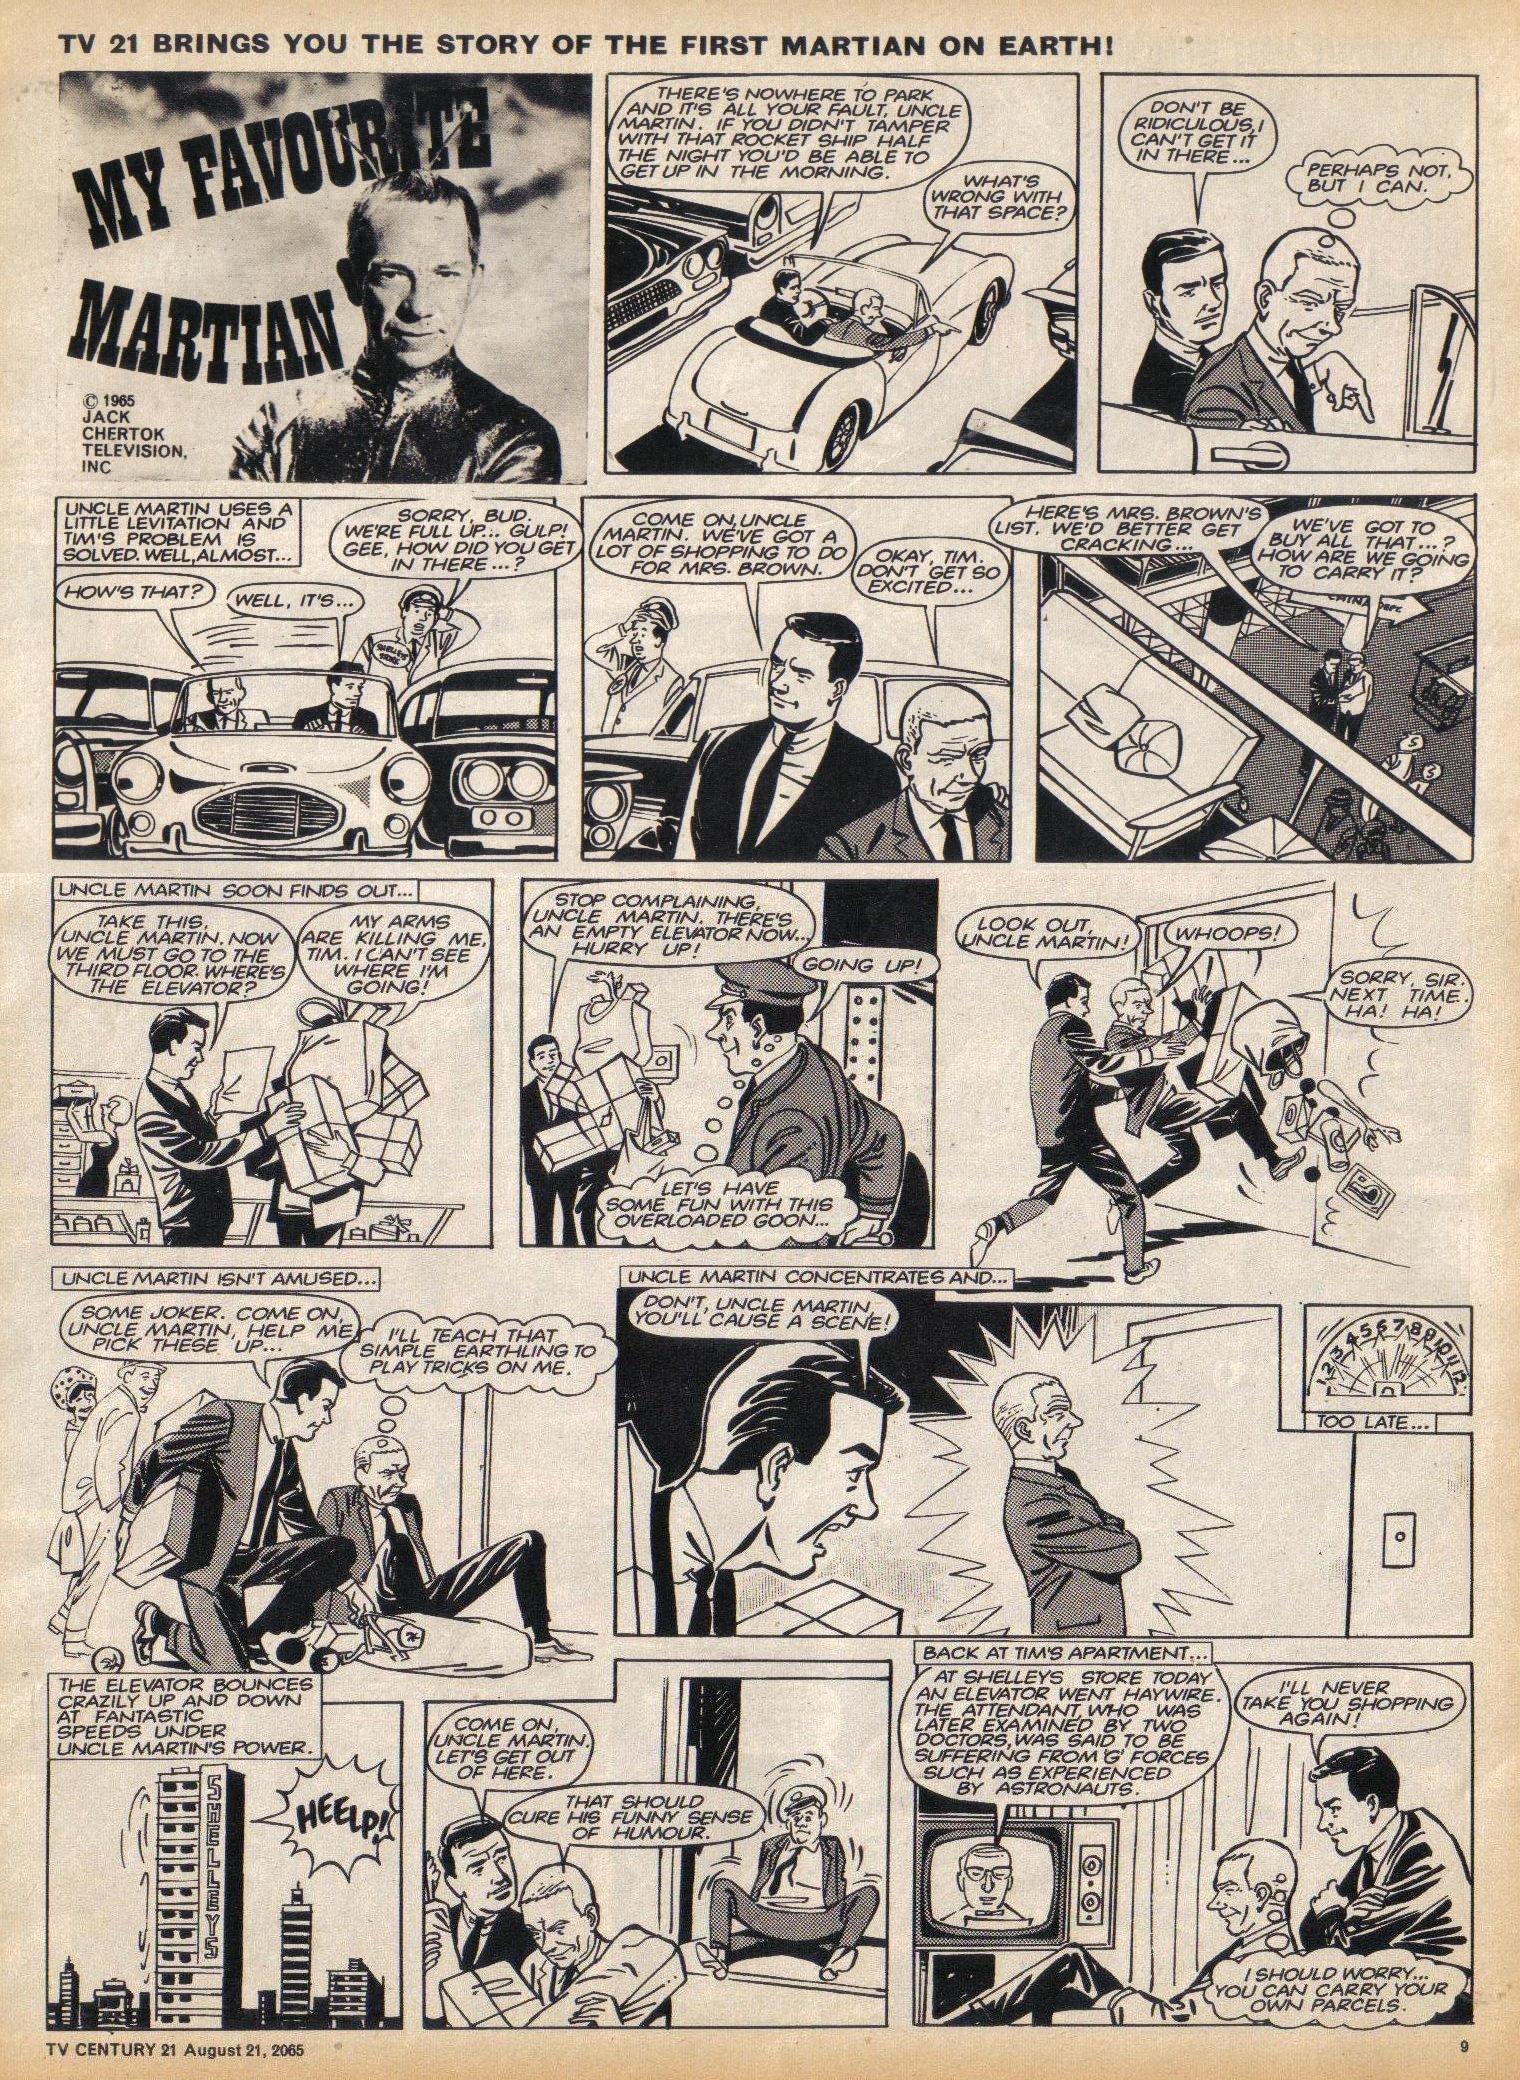 Read online TV Century 21 (TV 21) comic -  Issue #31 - 9